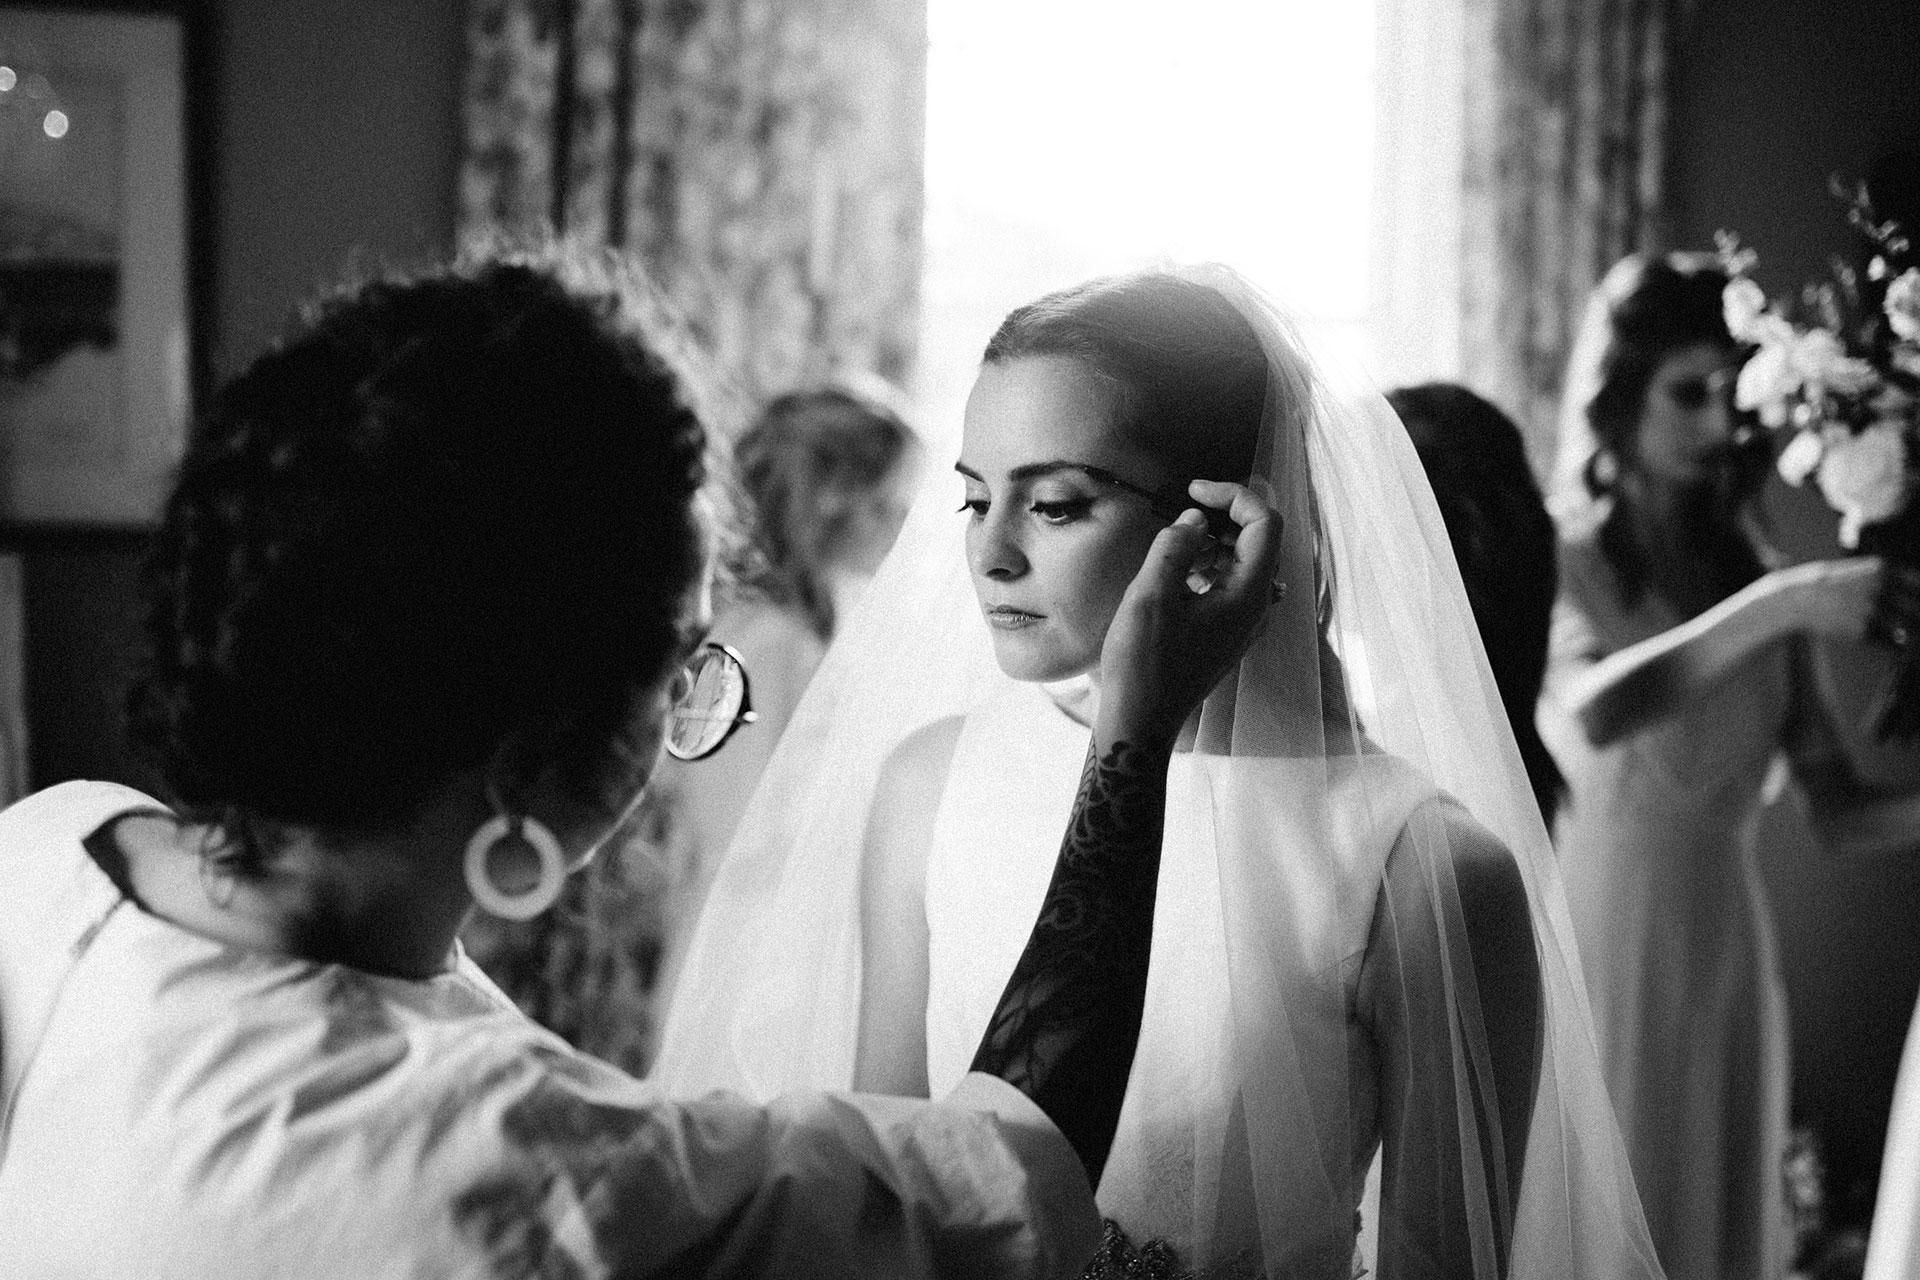 Langar-Hall-wedding-photographer-in-Nottinghamshire-Michael-Newington-Gray-27.jpg